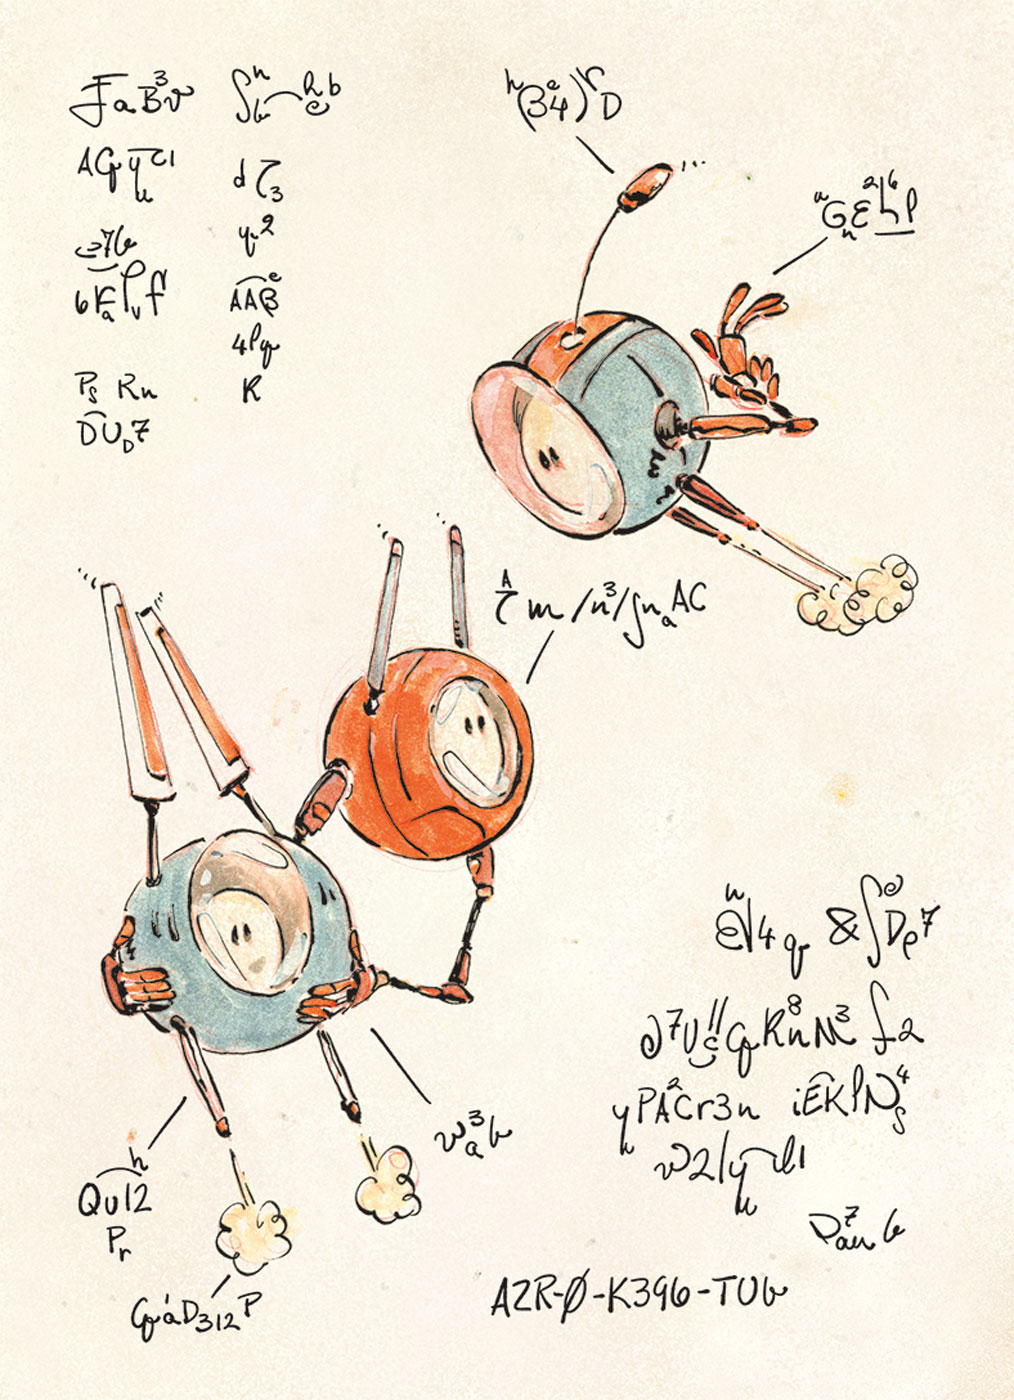 AZR-0 Robots - Book Illustration - sample page 2